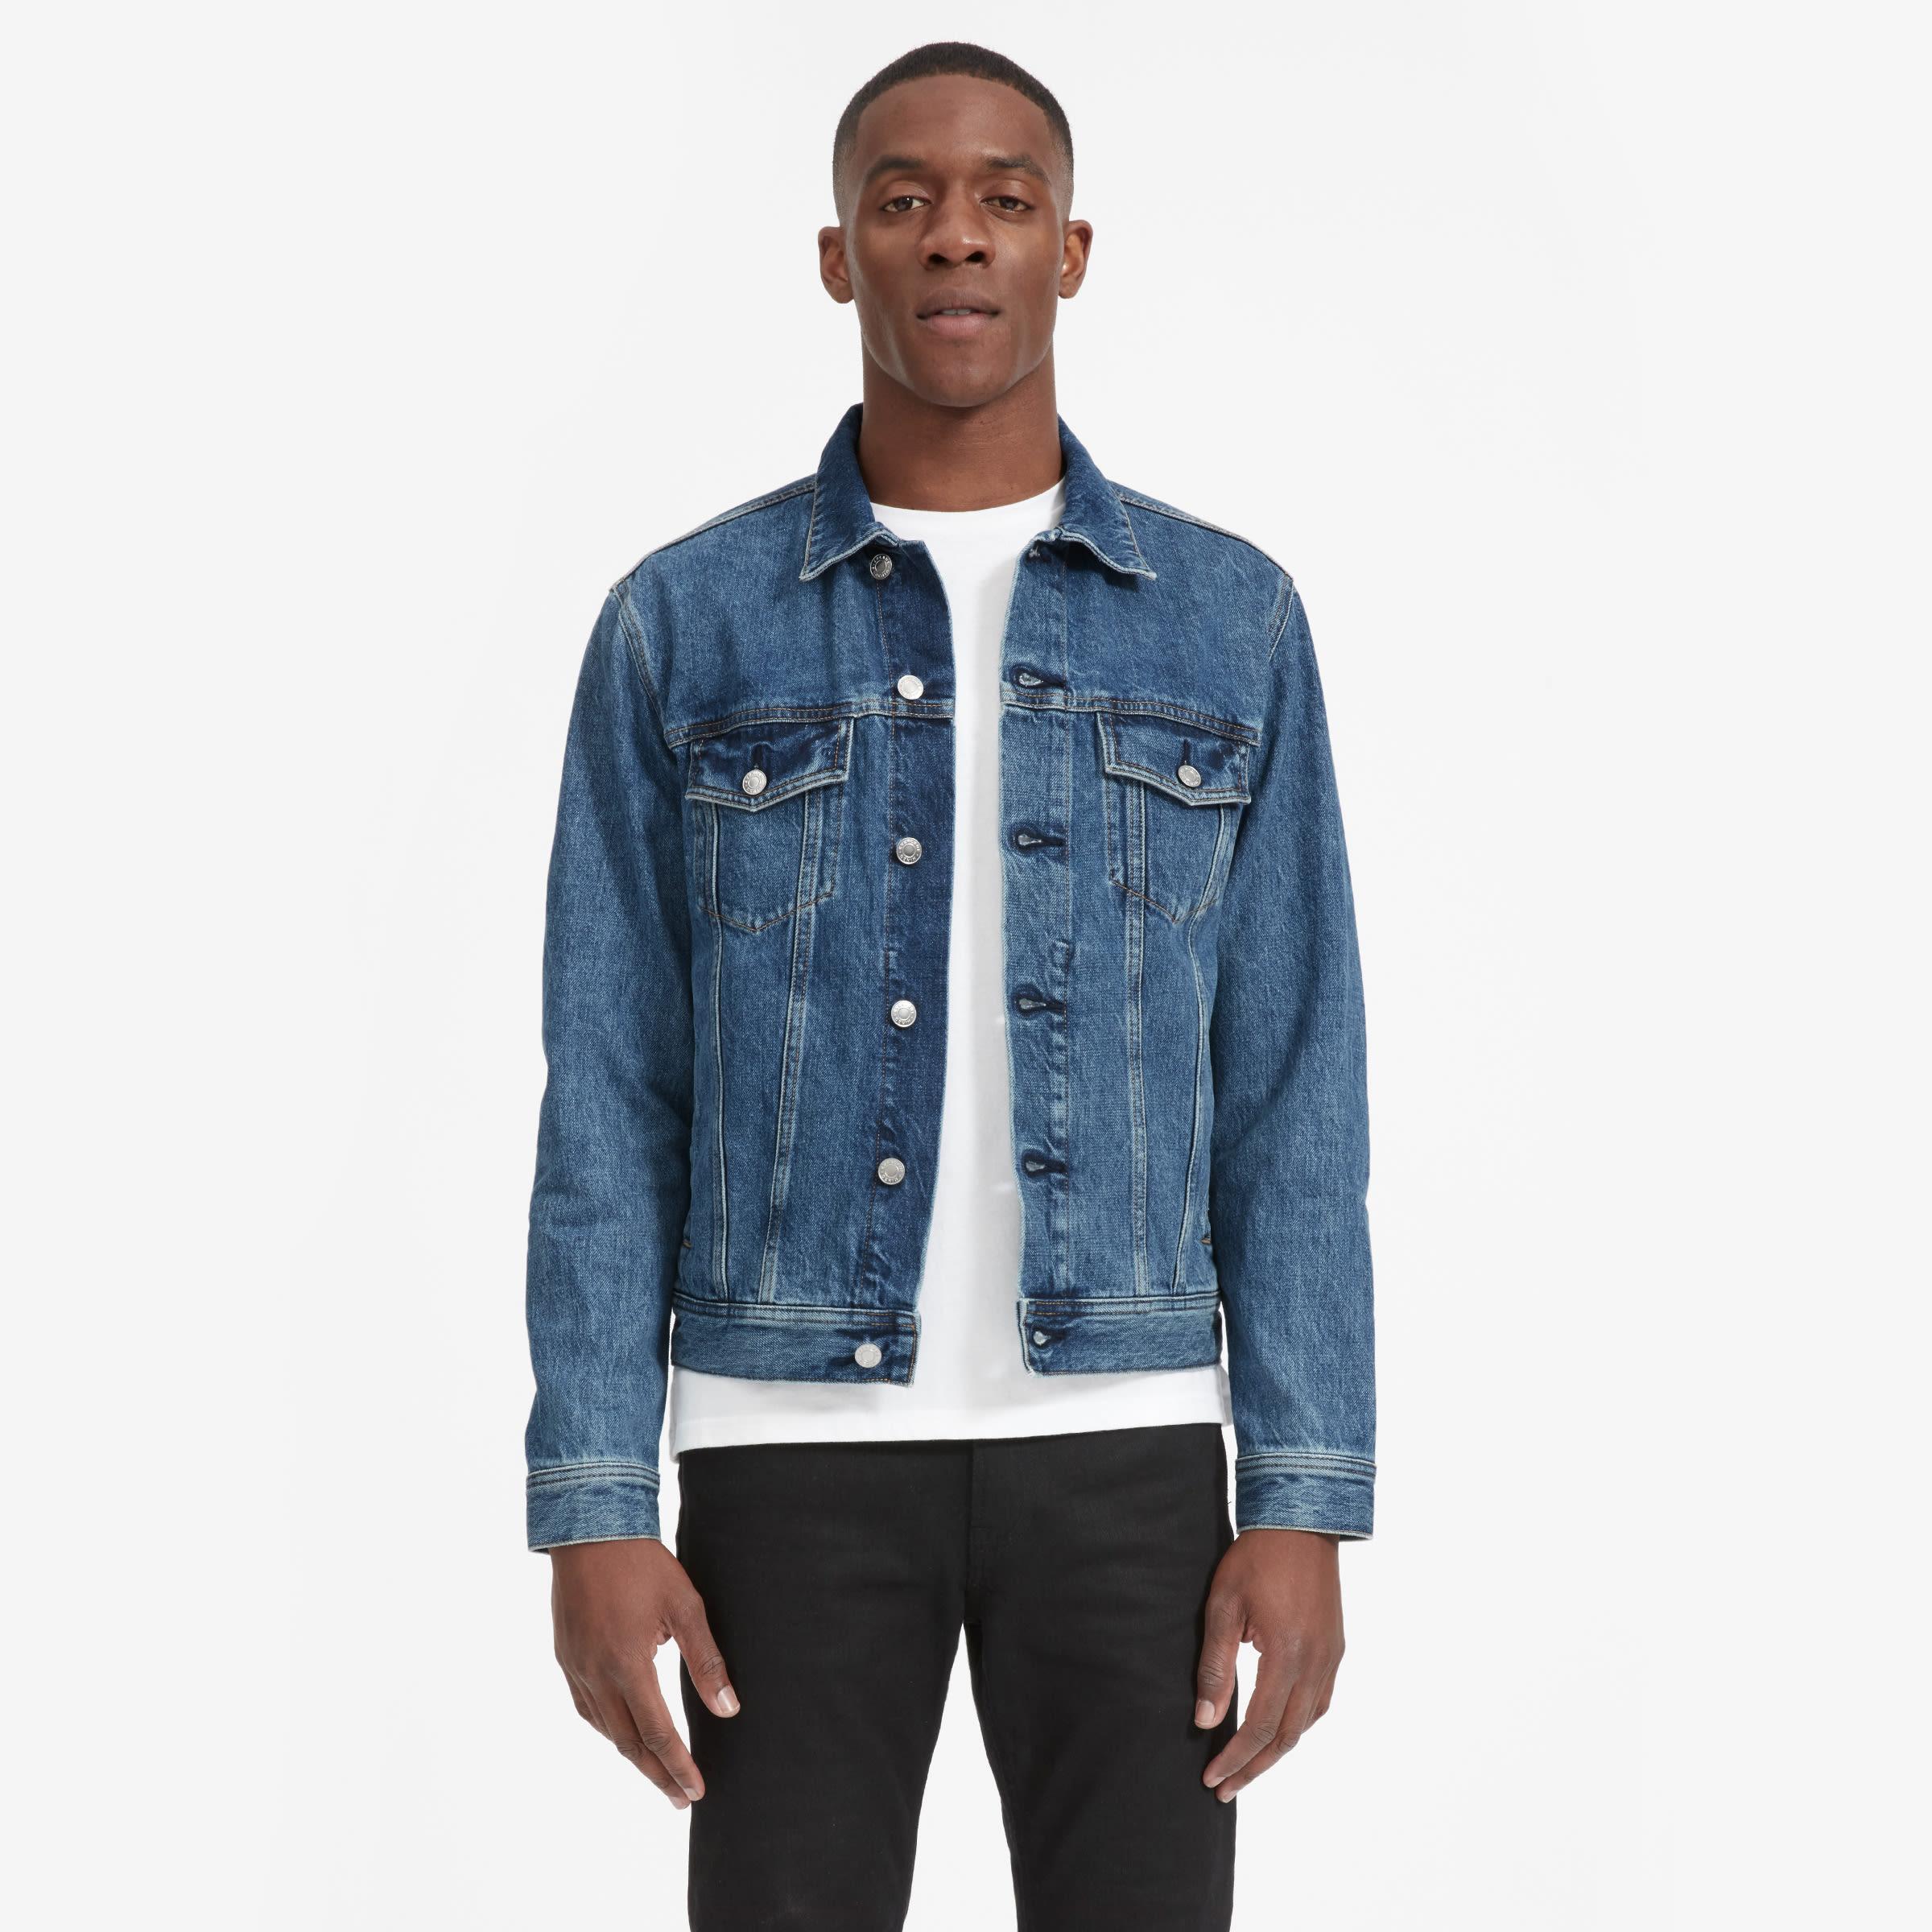 custom discount coupon luxuriant in design The Denim Jacket | Uniform